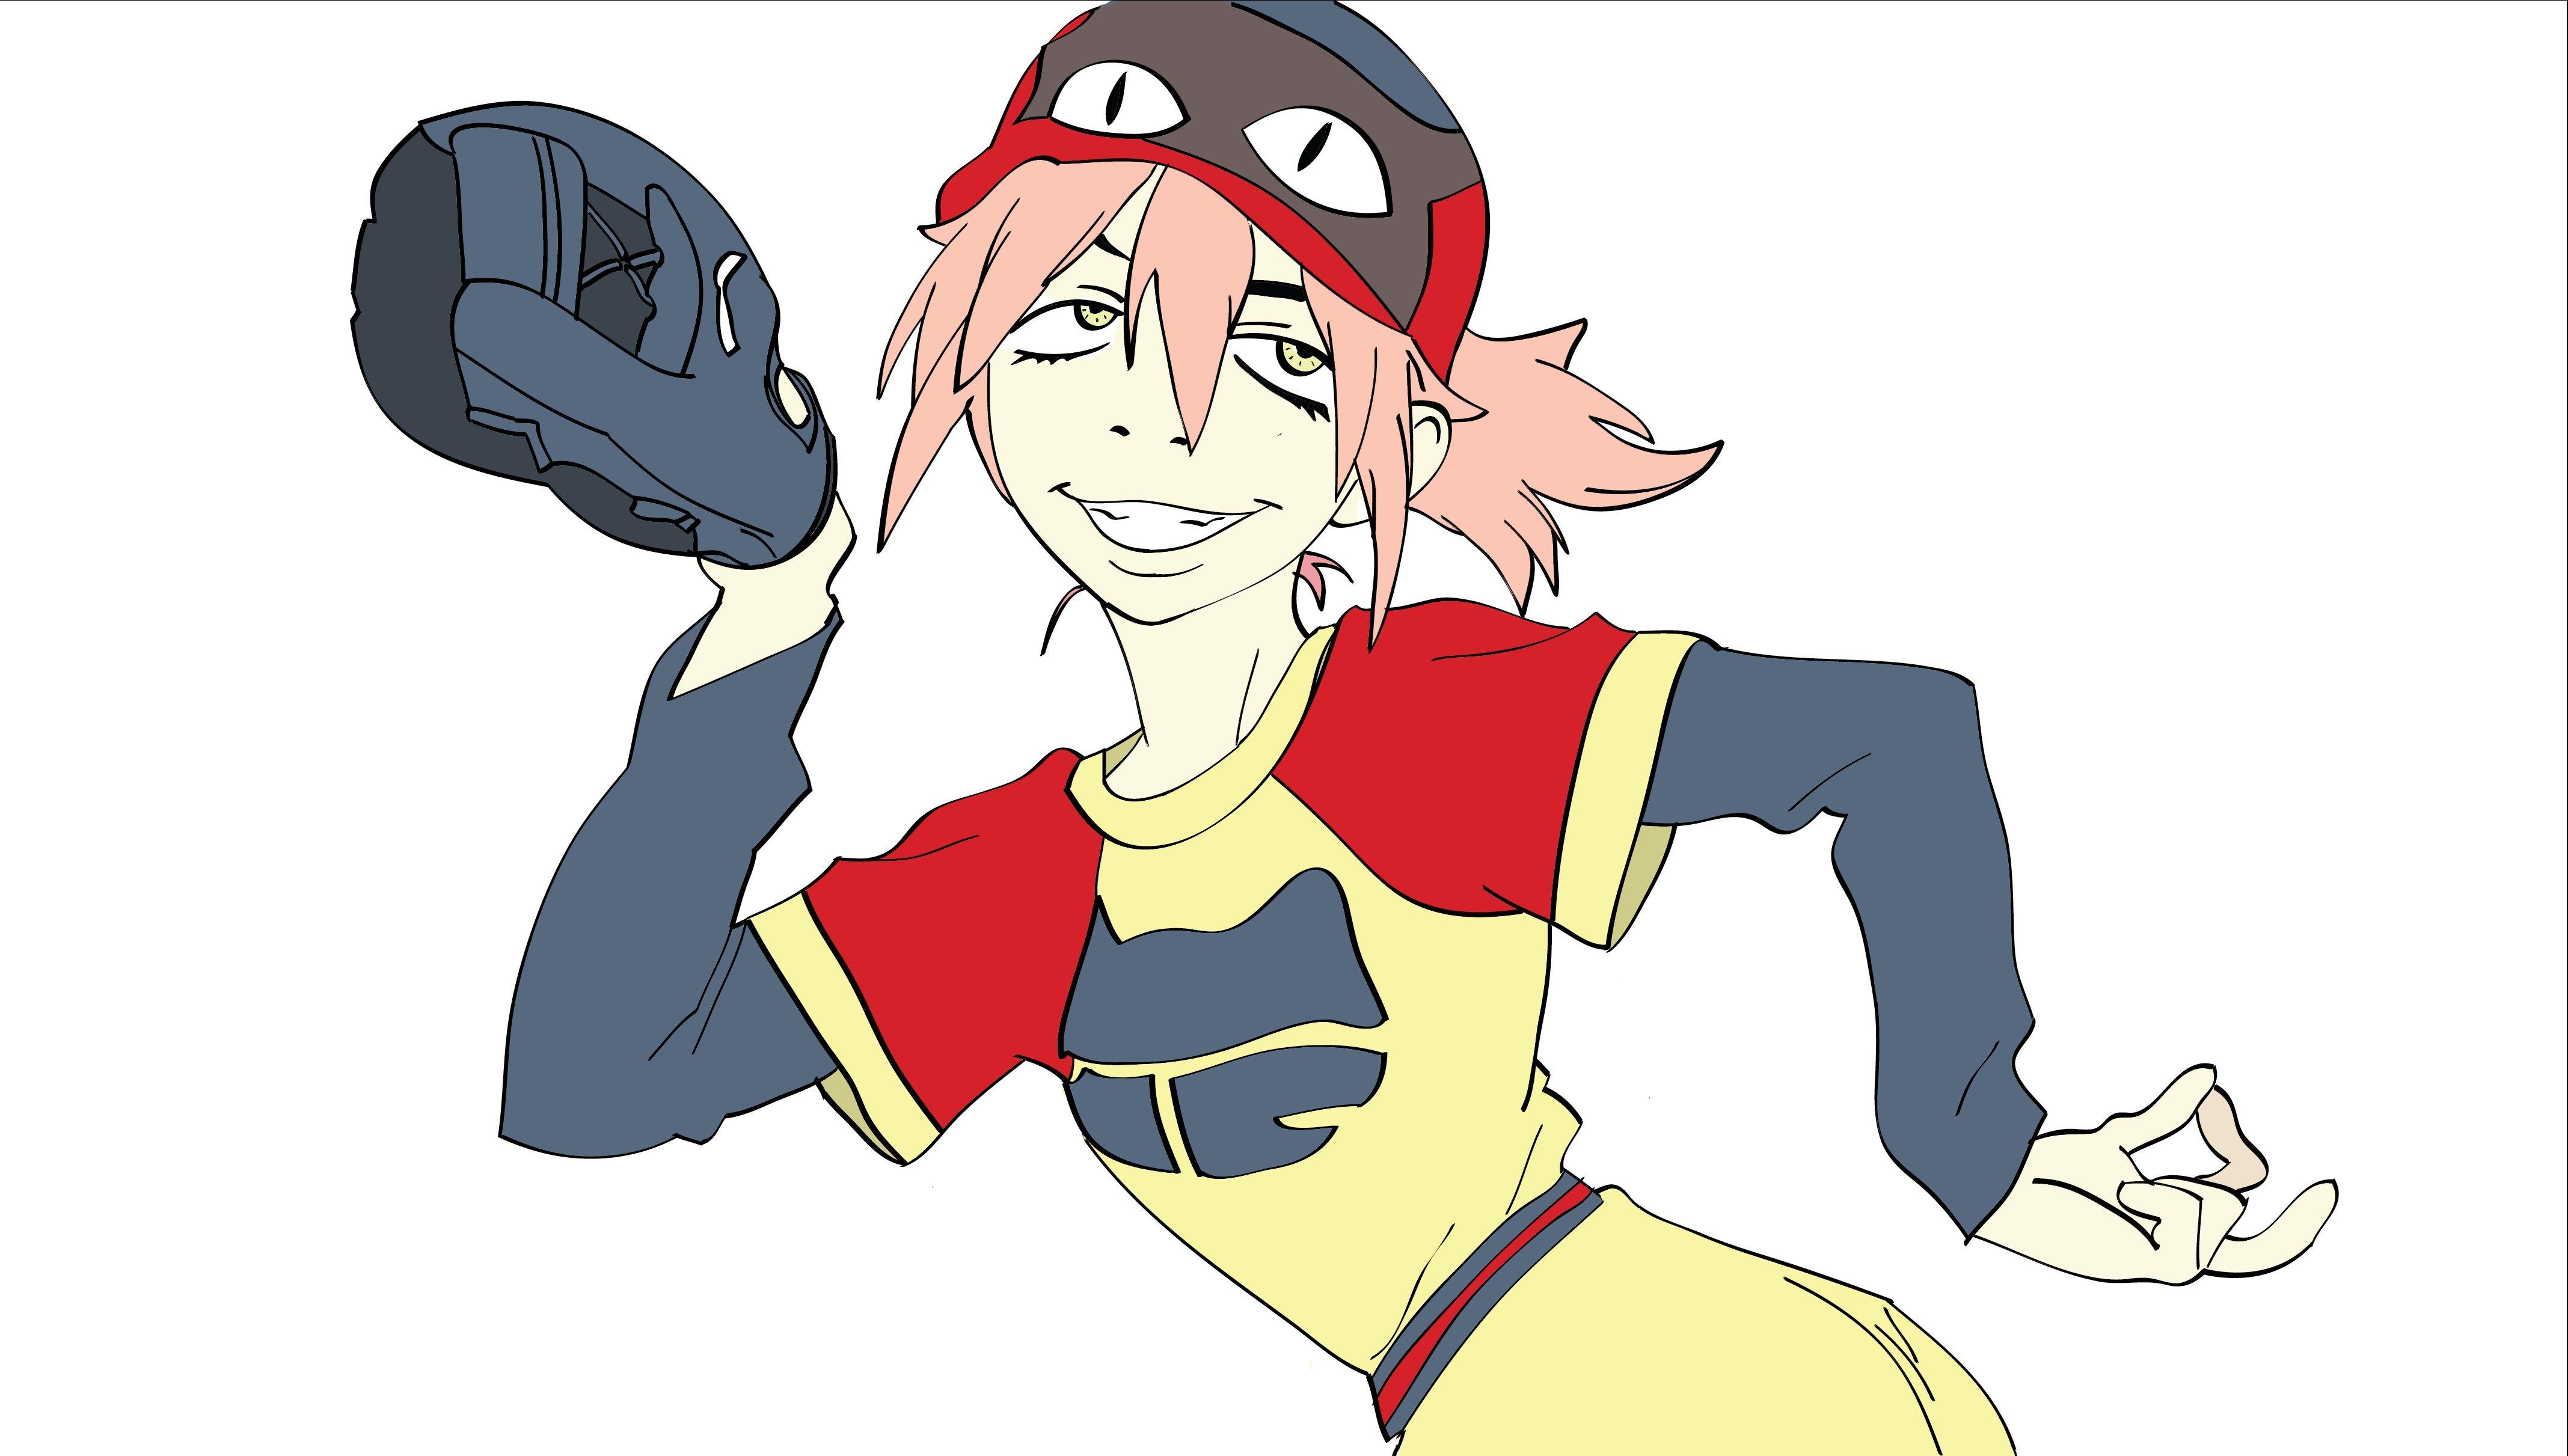 Haruko haruhara uniforme de beibol flcl cosplay anime manga cosplay - Flcl haruko haruhara ...